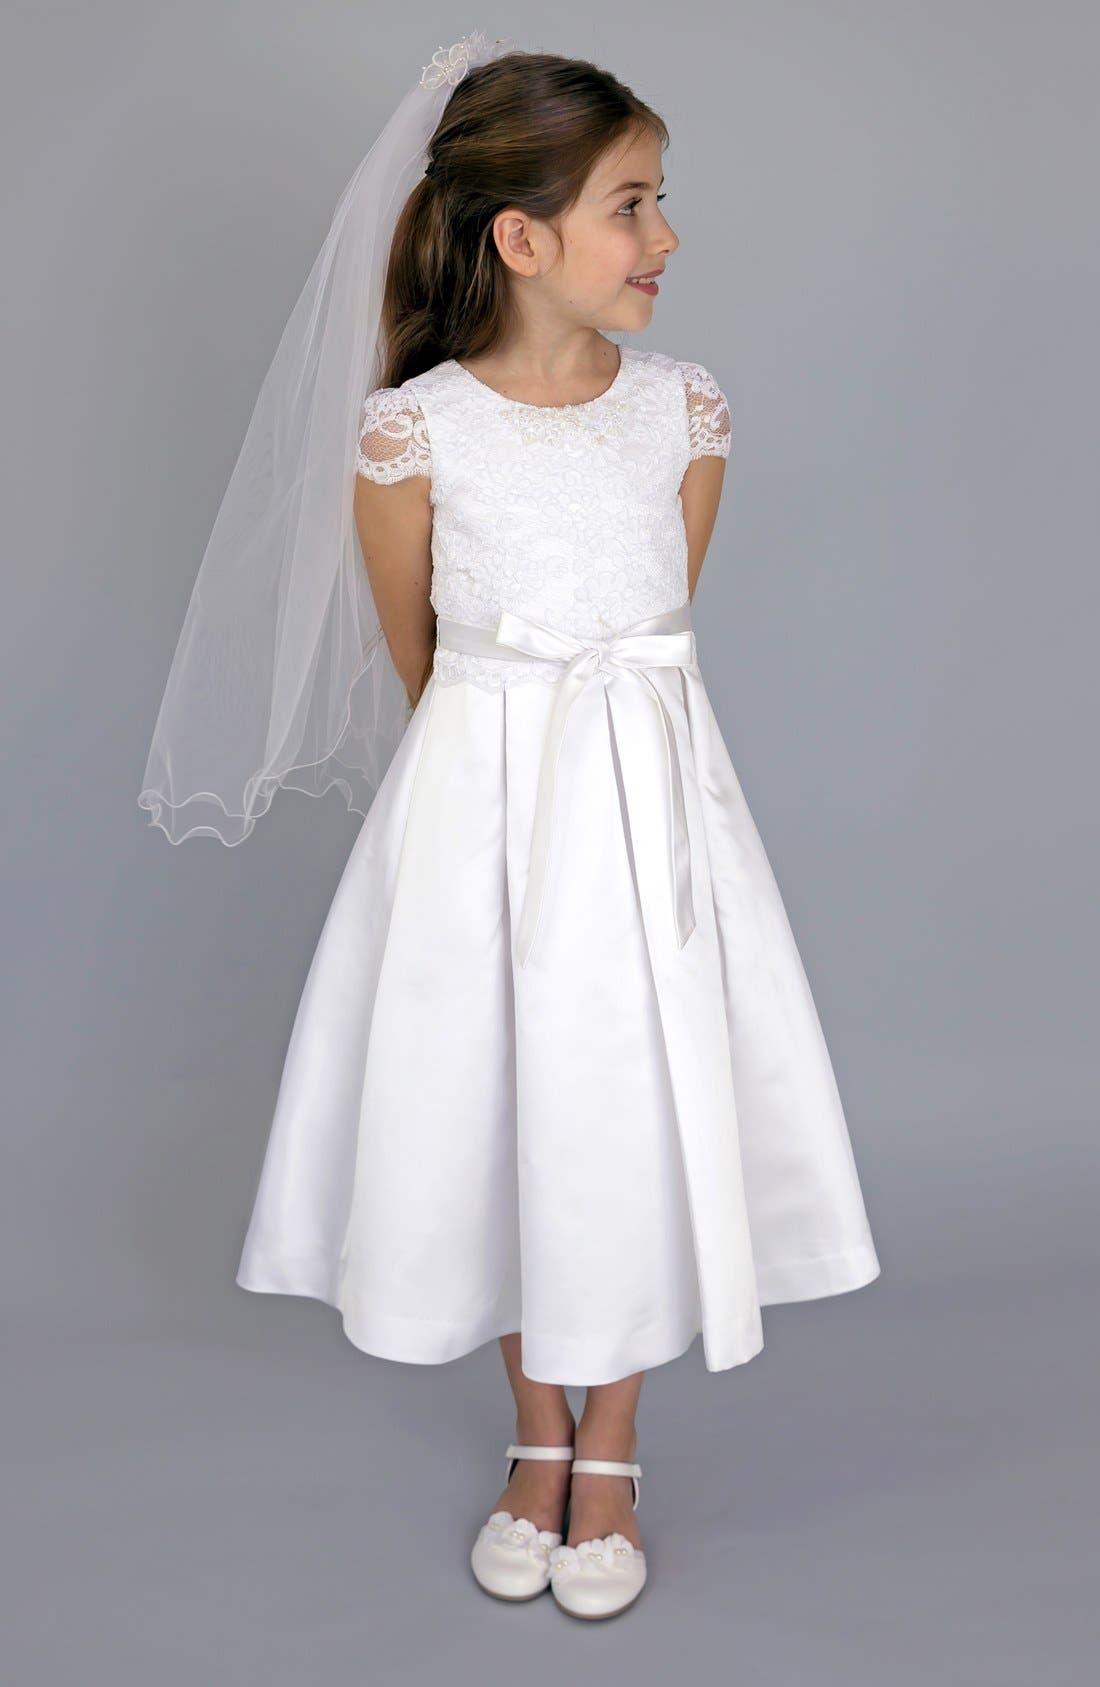 Us Angels Lace Bodice Box Pleat Dress (Little Girls, Big Girls & Girls Plus)